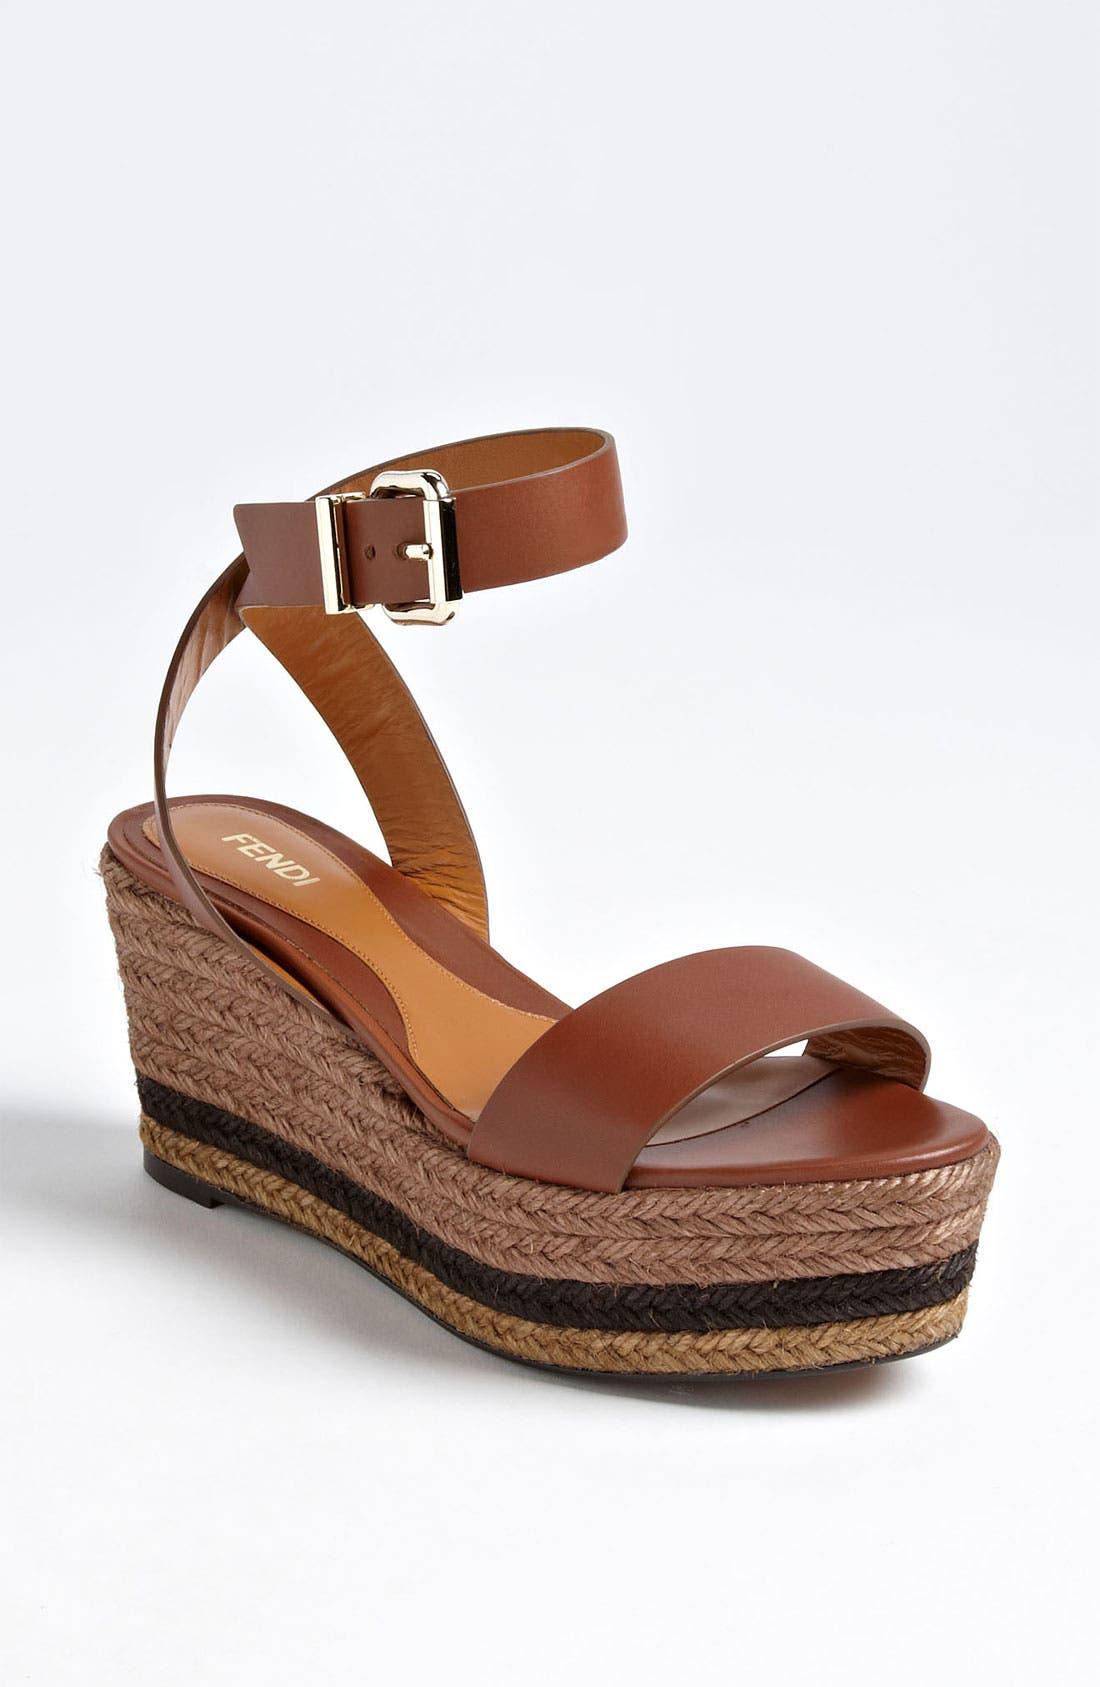 Main Image - Fendi 'Pequin' Sandal